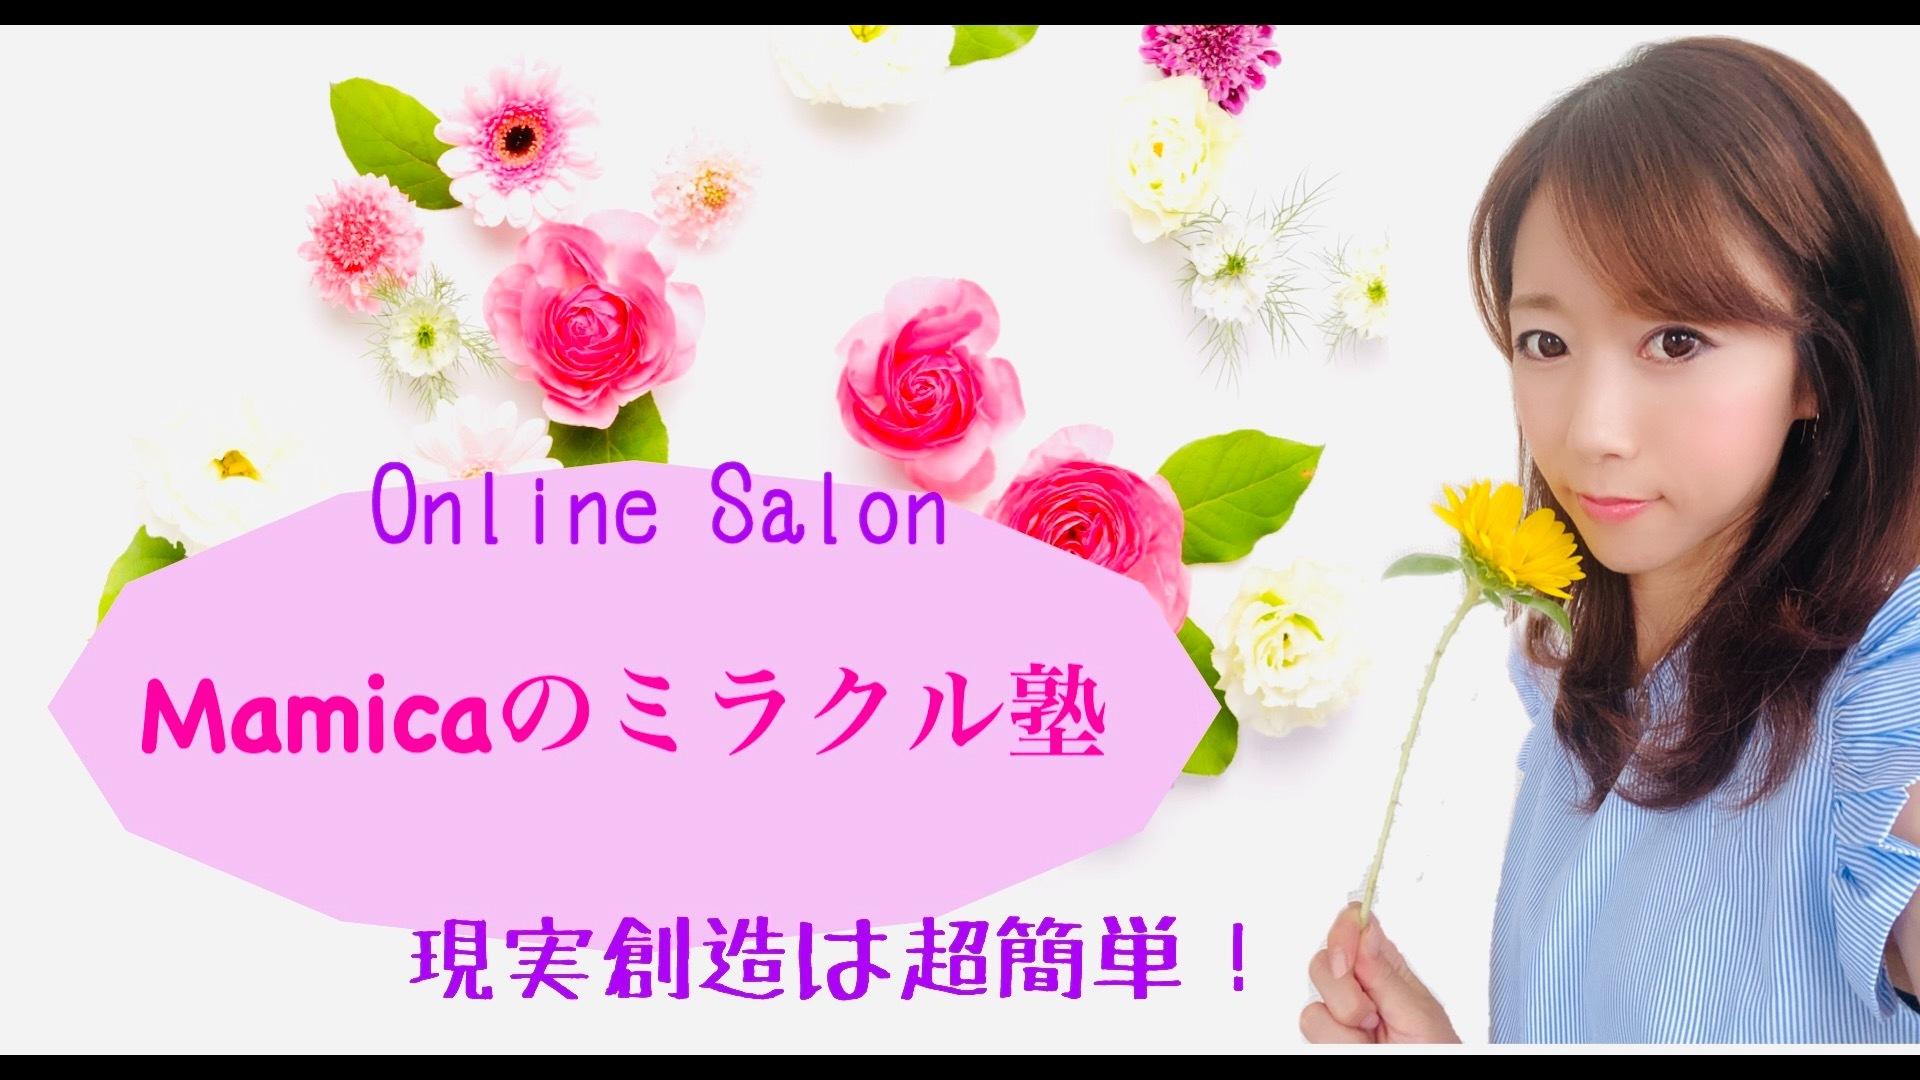 Mamicaオフィシャルオンラインサロン「ミラクル塾」